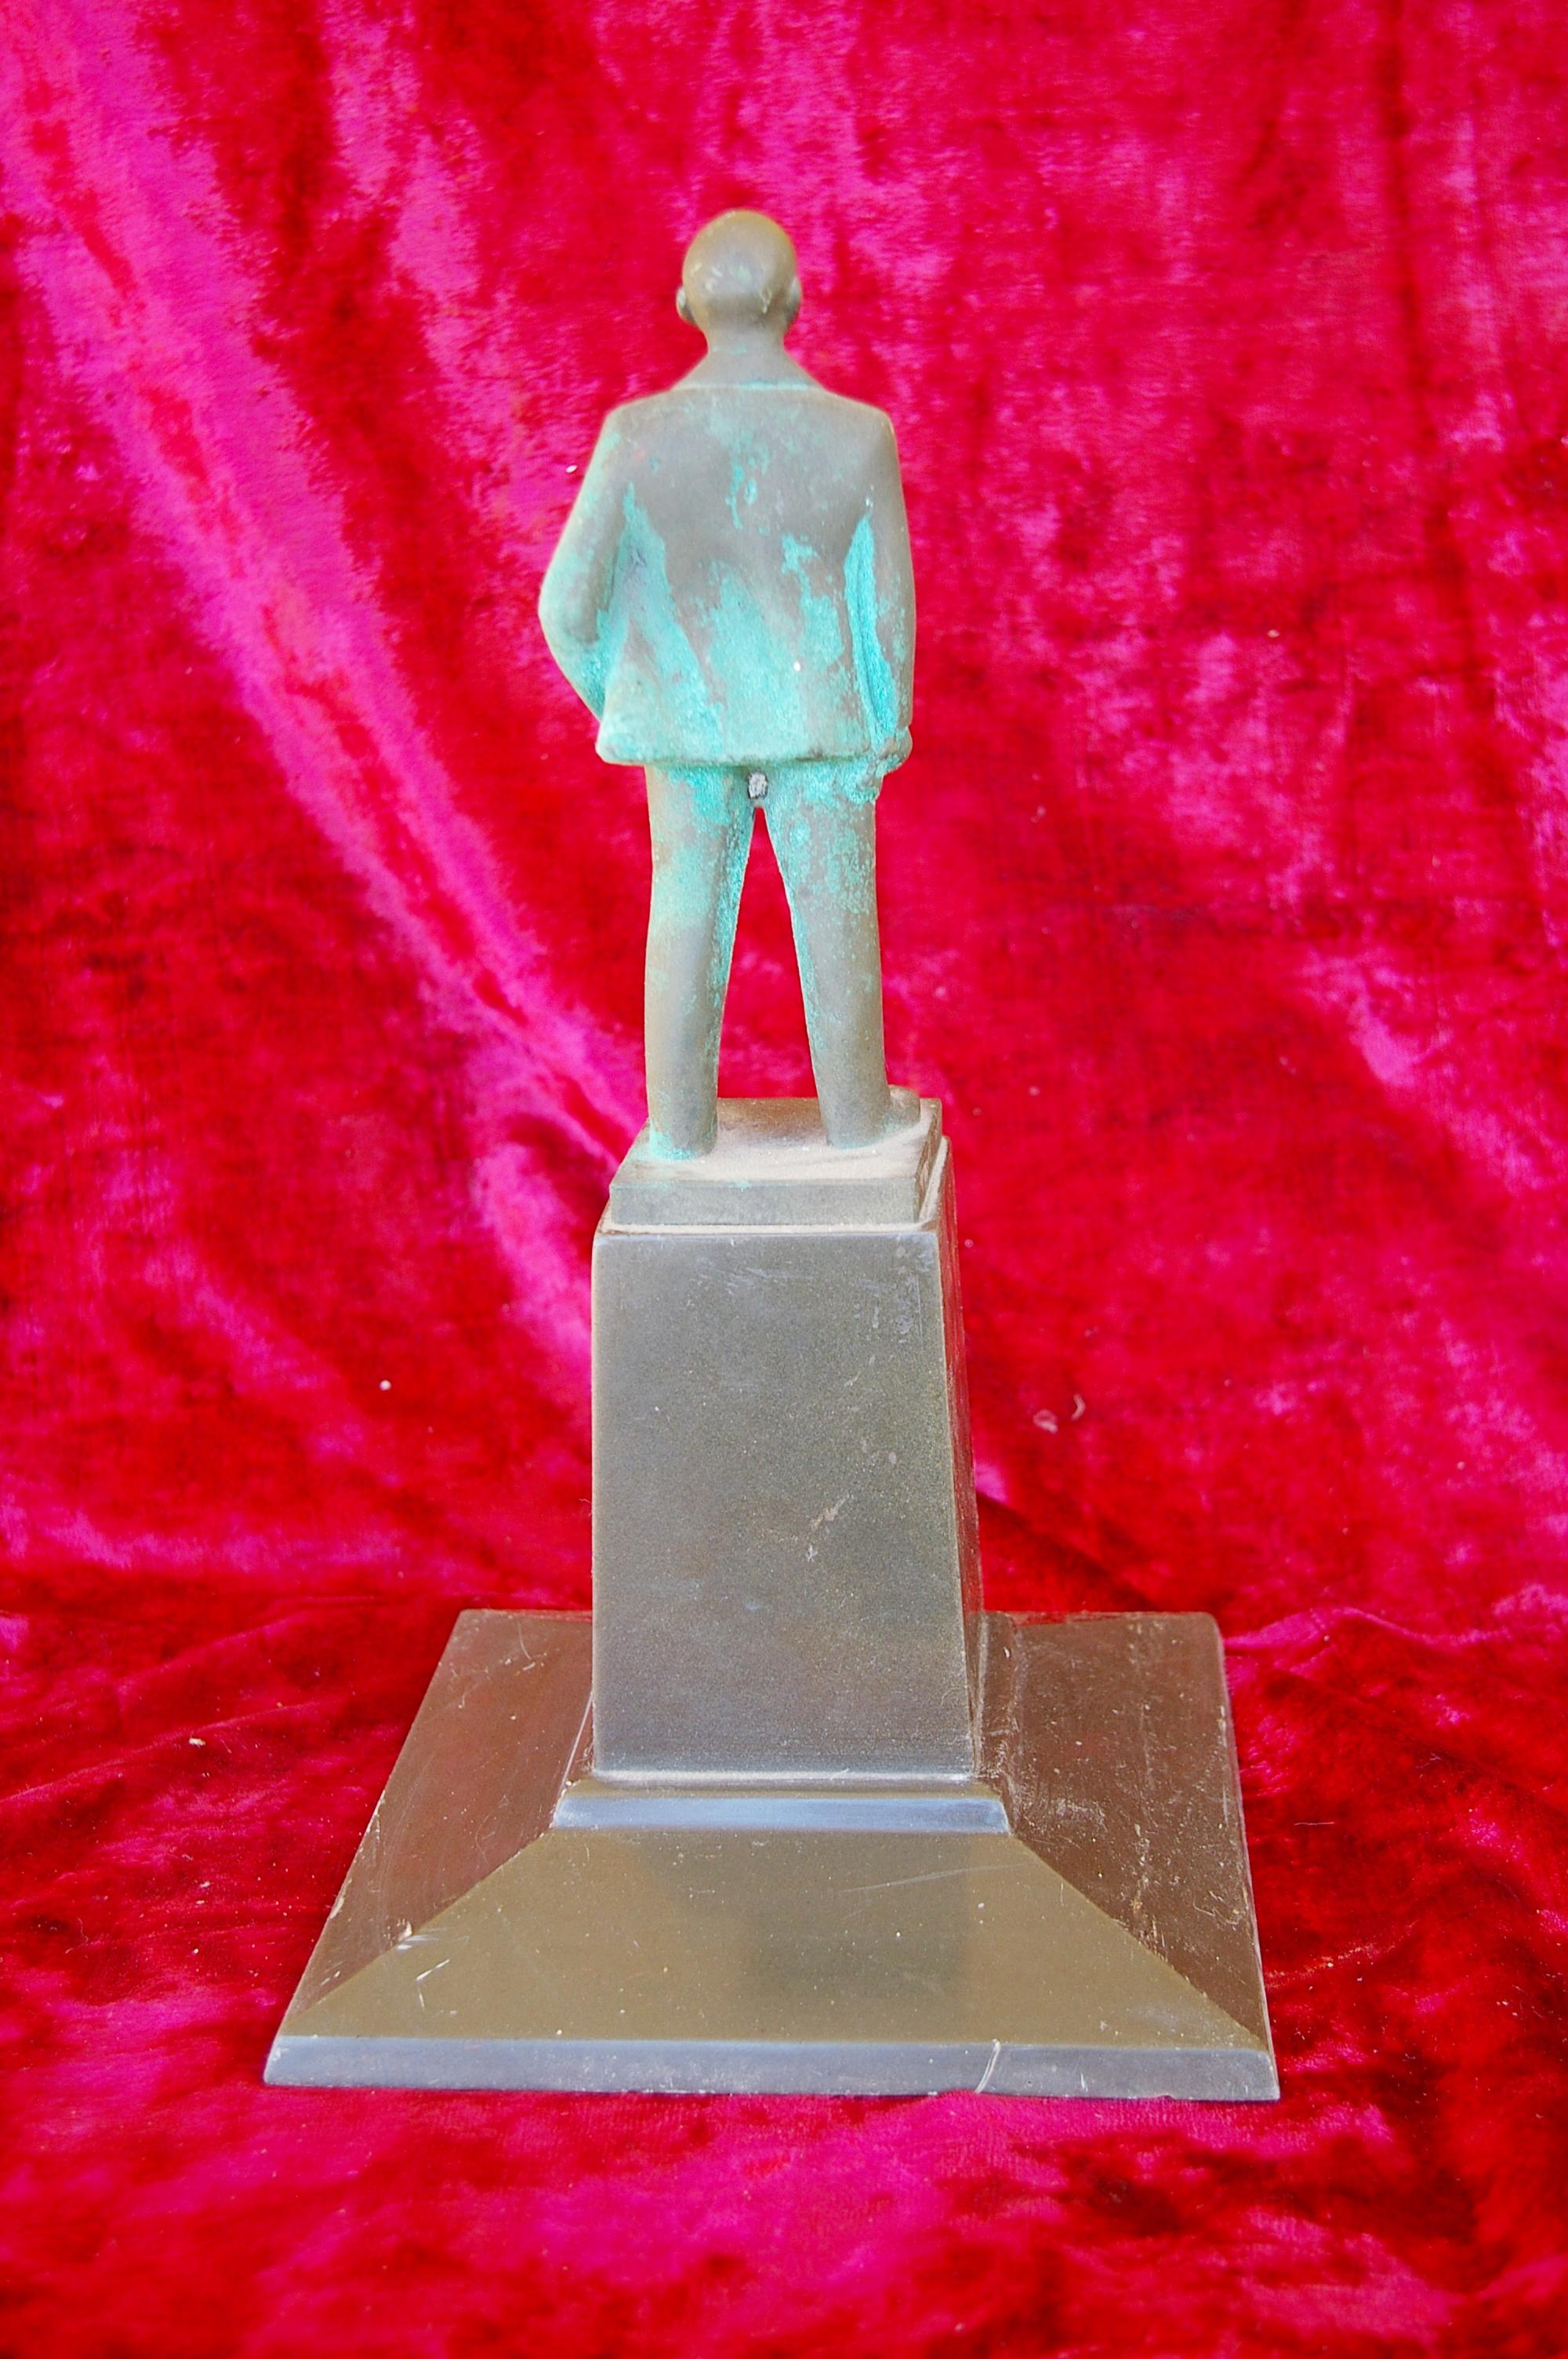 Скульптура Ленин на постаменте, материал бронза, высота 35 см., ширина 20 см., длина 20 см. - 2